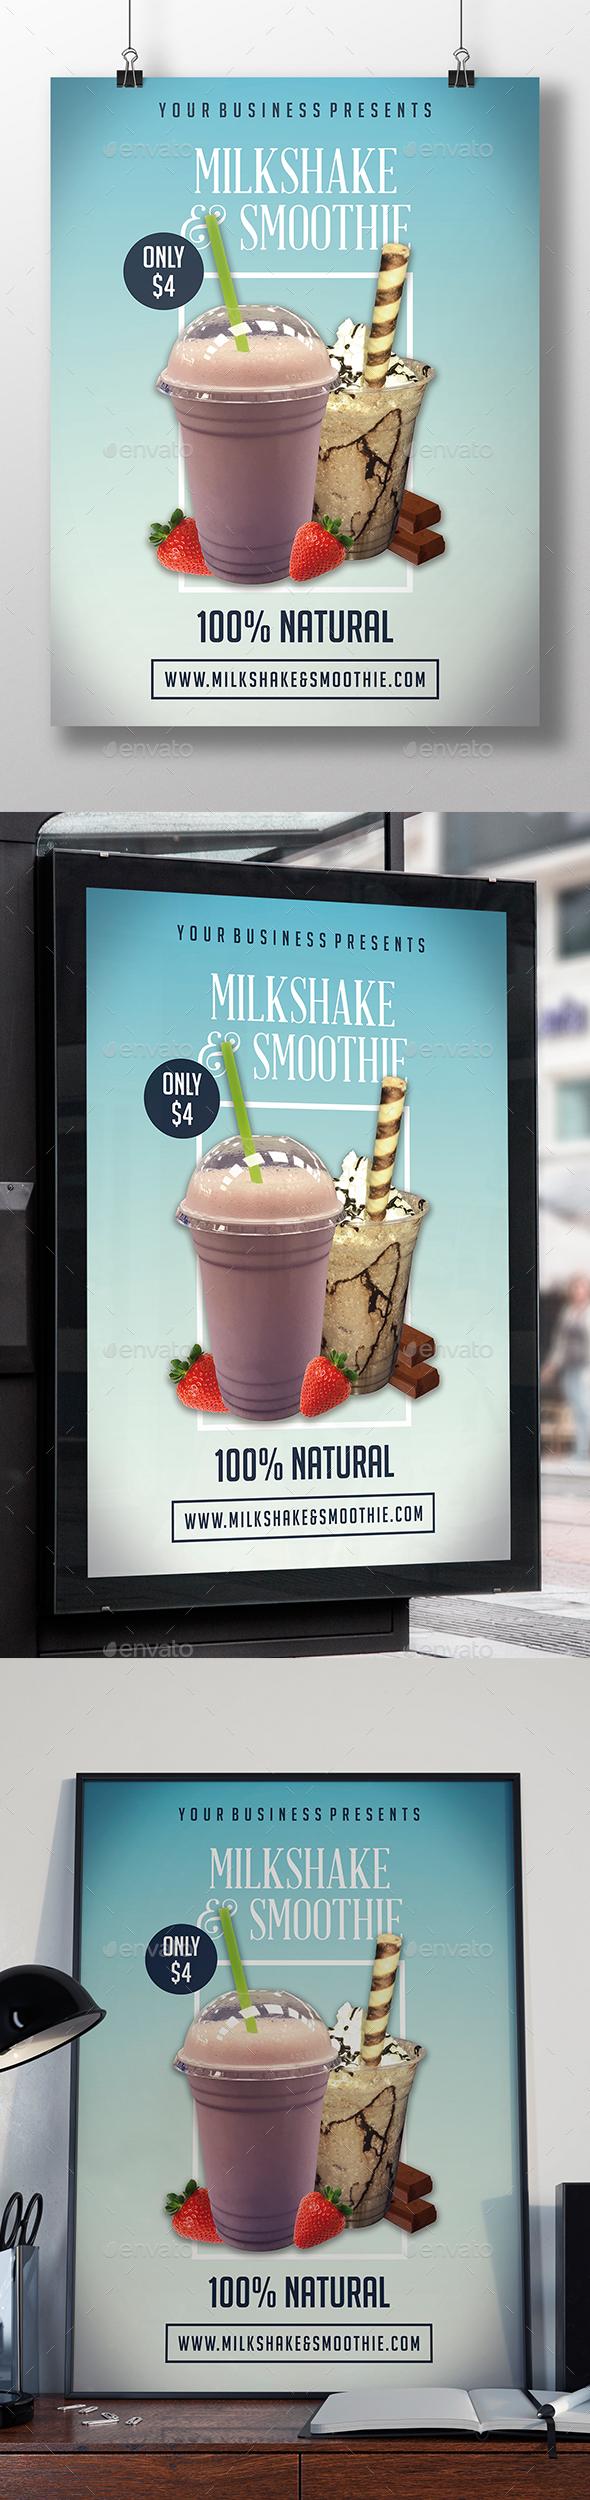 GraphicRiver Milkshake & Smoothie Flyer Template 20678561